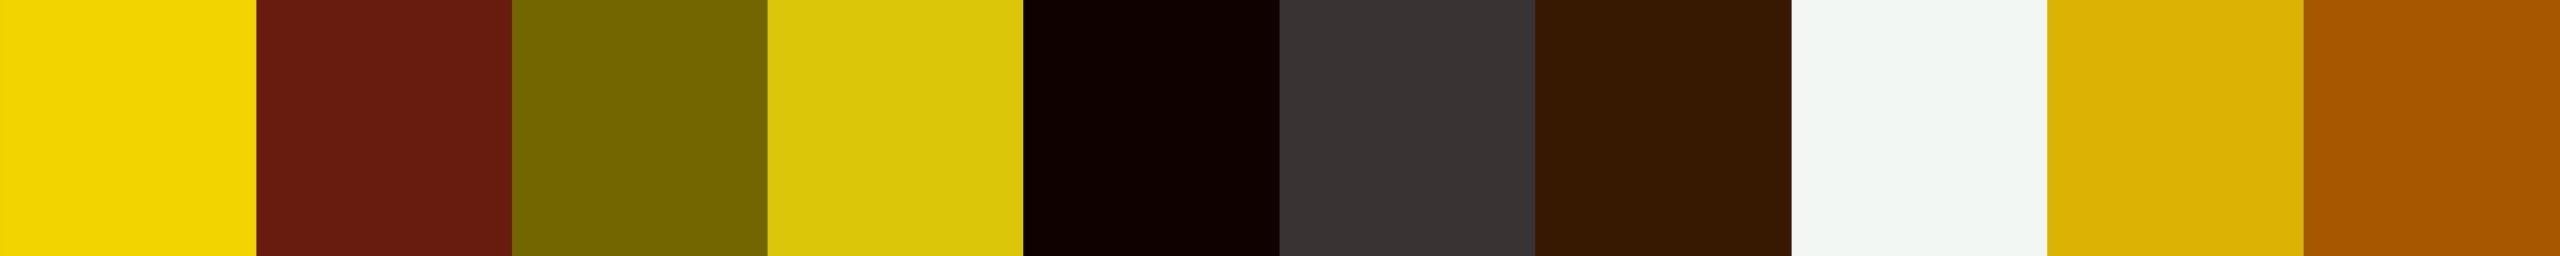 54 Beviala Color Palette